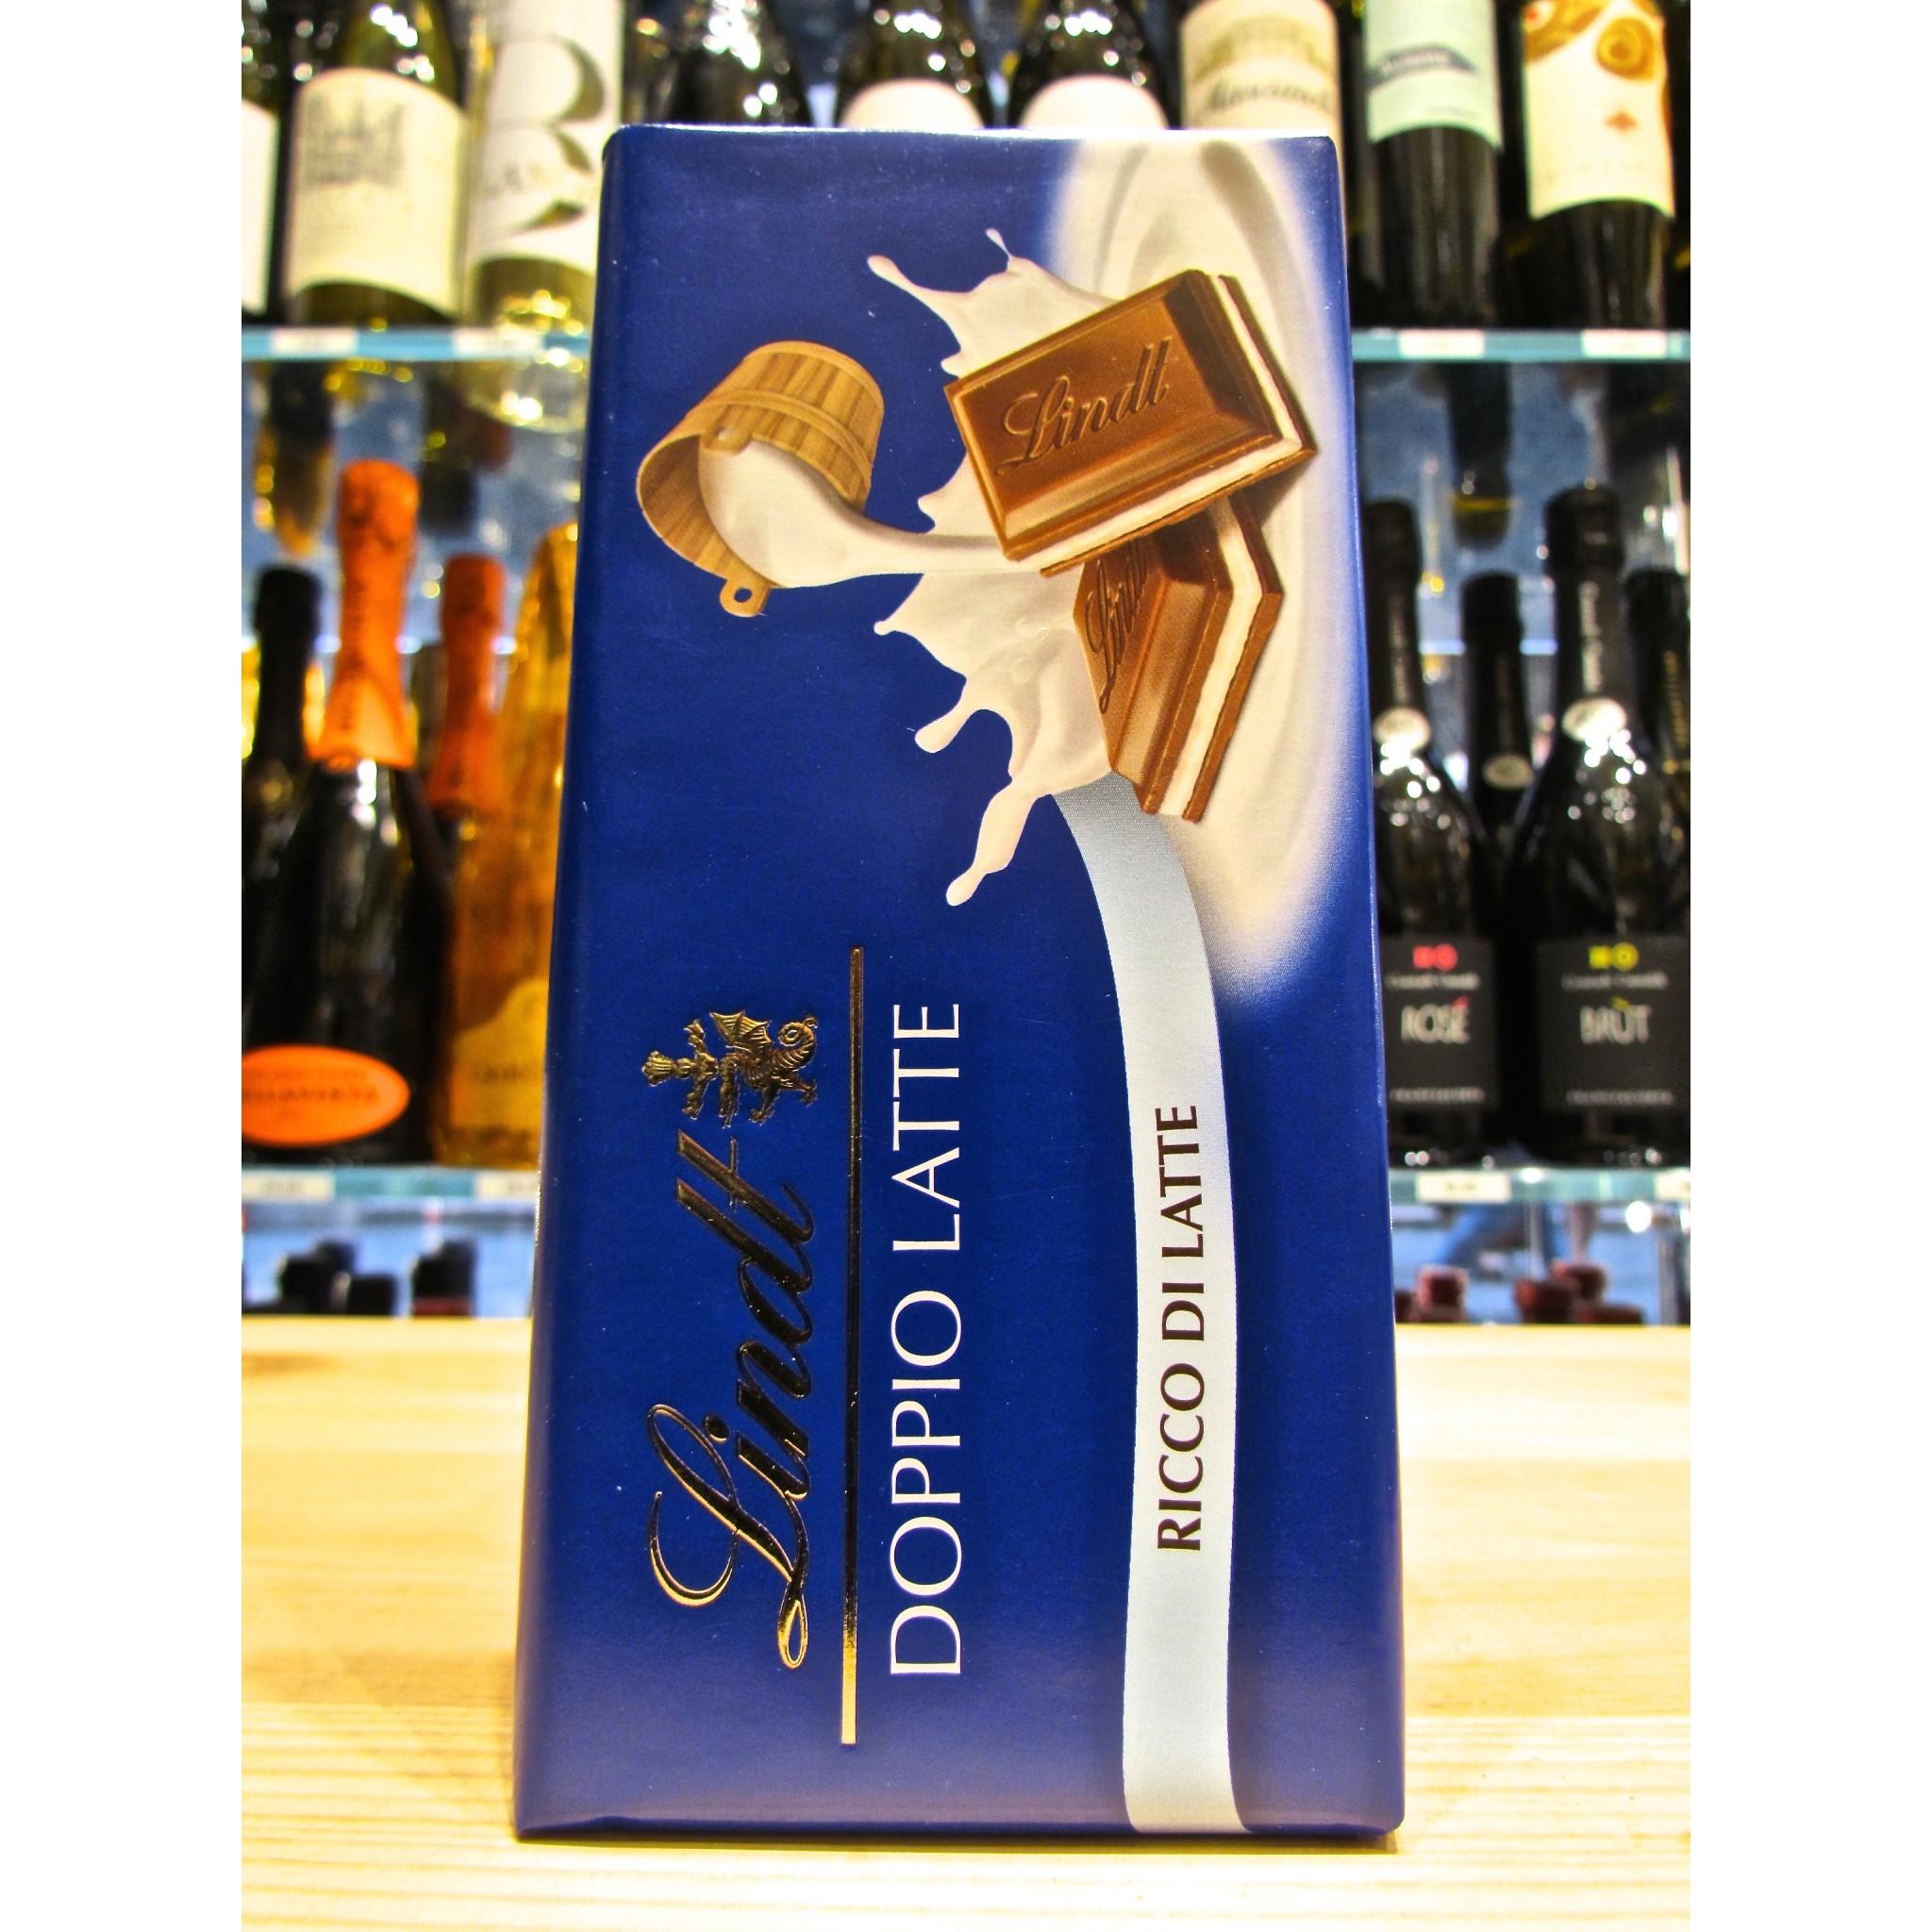 Vendita Online Tavolette Di Cioccolato Lindt & Sprüngli